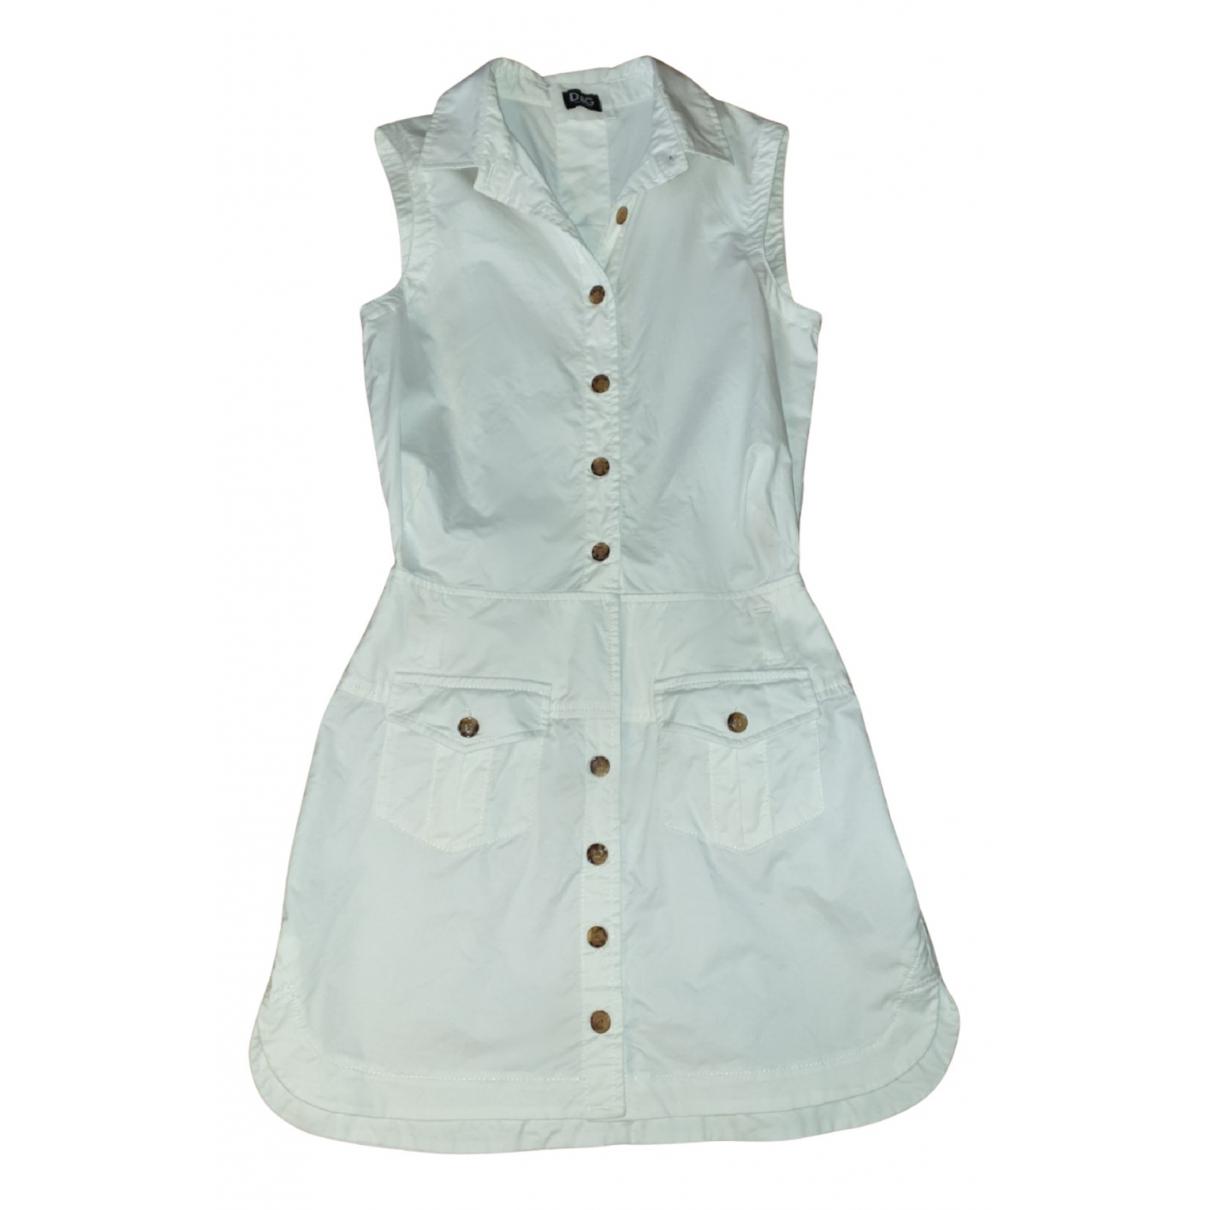 D&g N White Cotton - elasthane dress for Women 40 IT